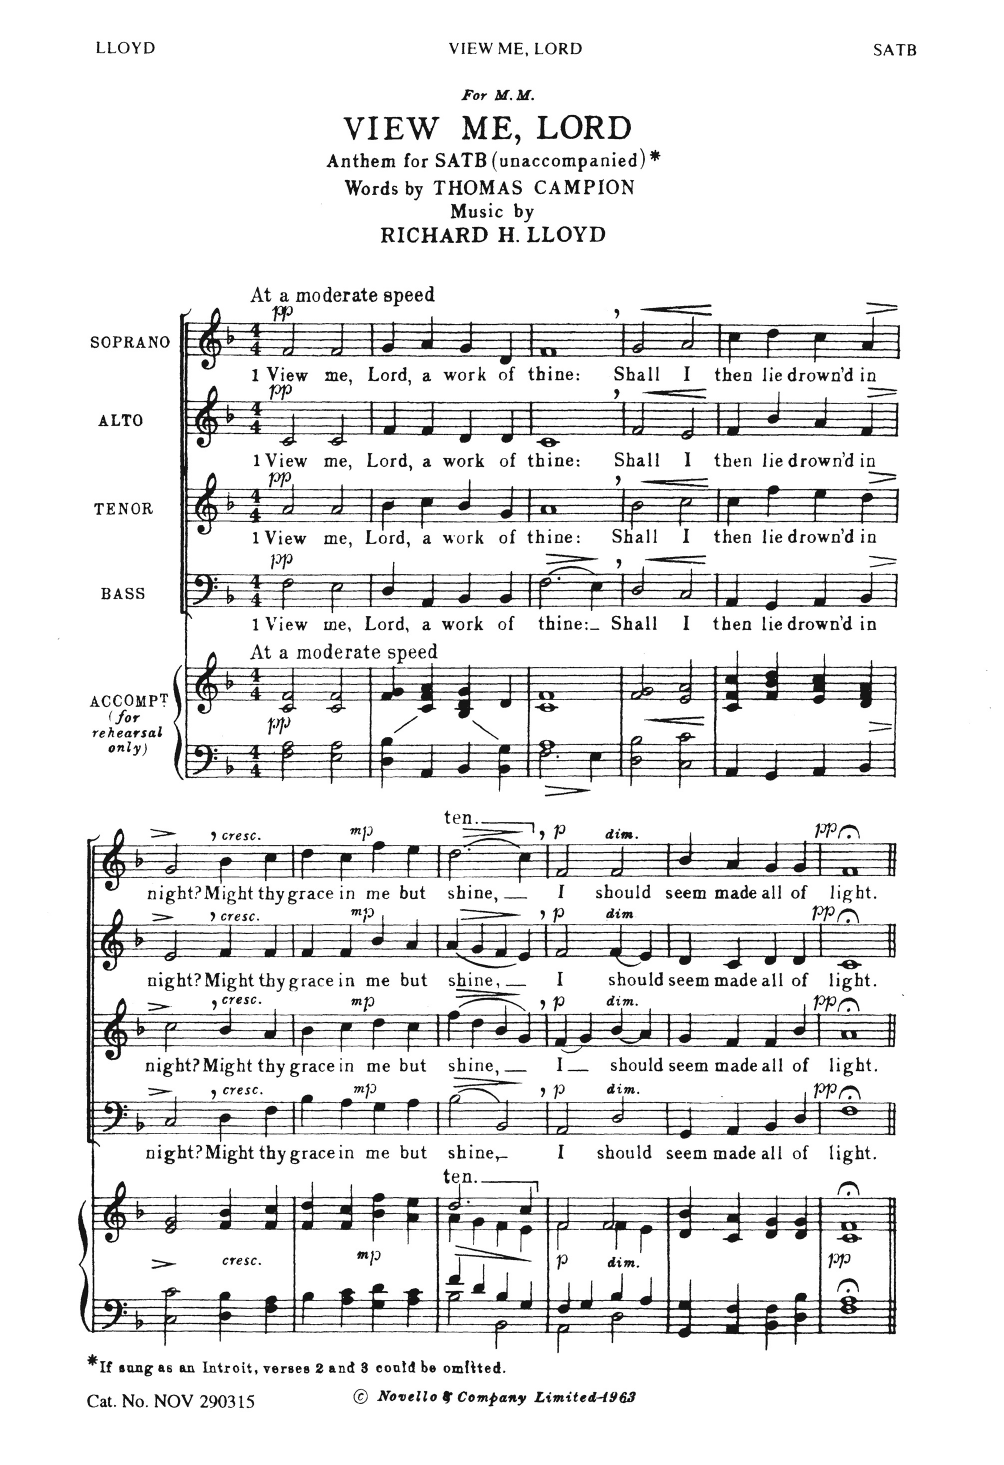 Richard H. Lloyd - View Me Lord